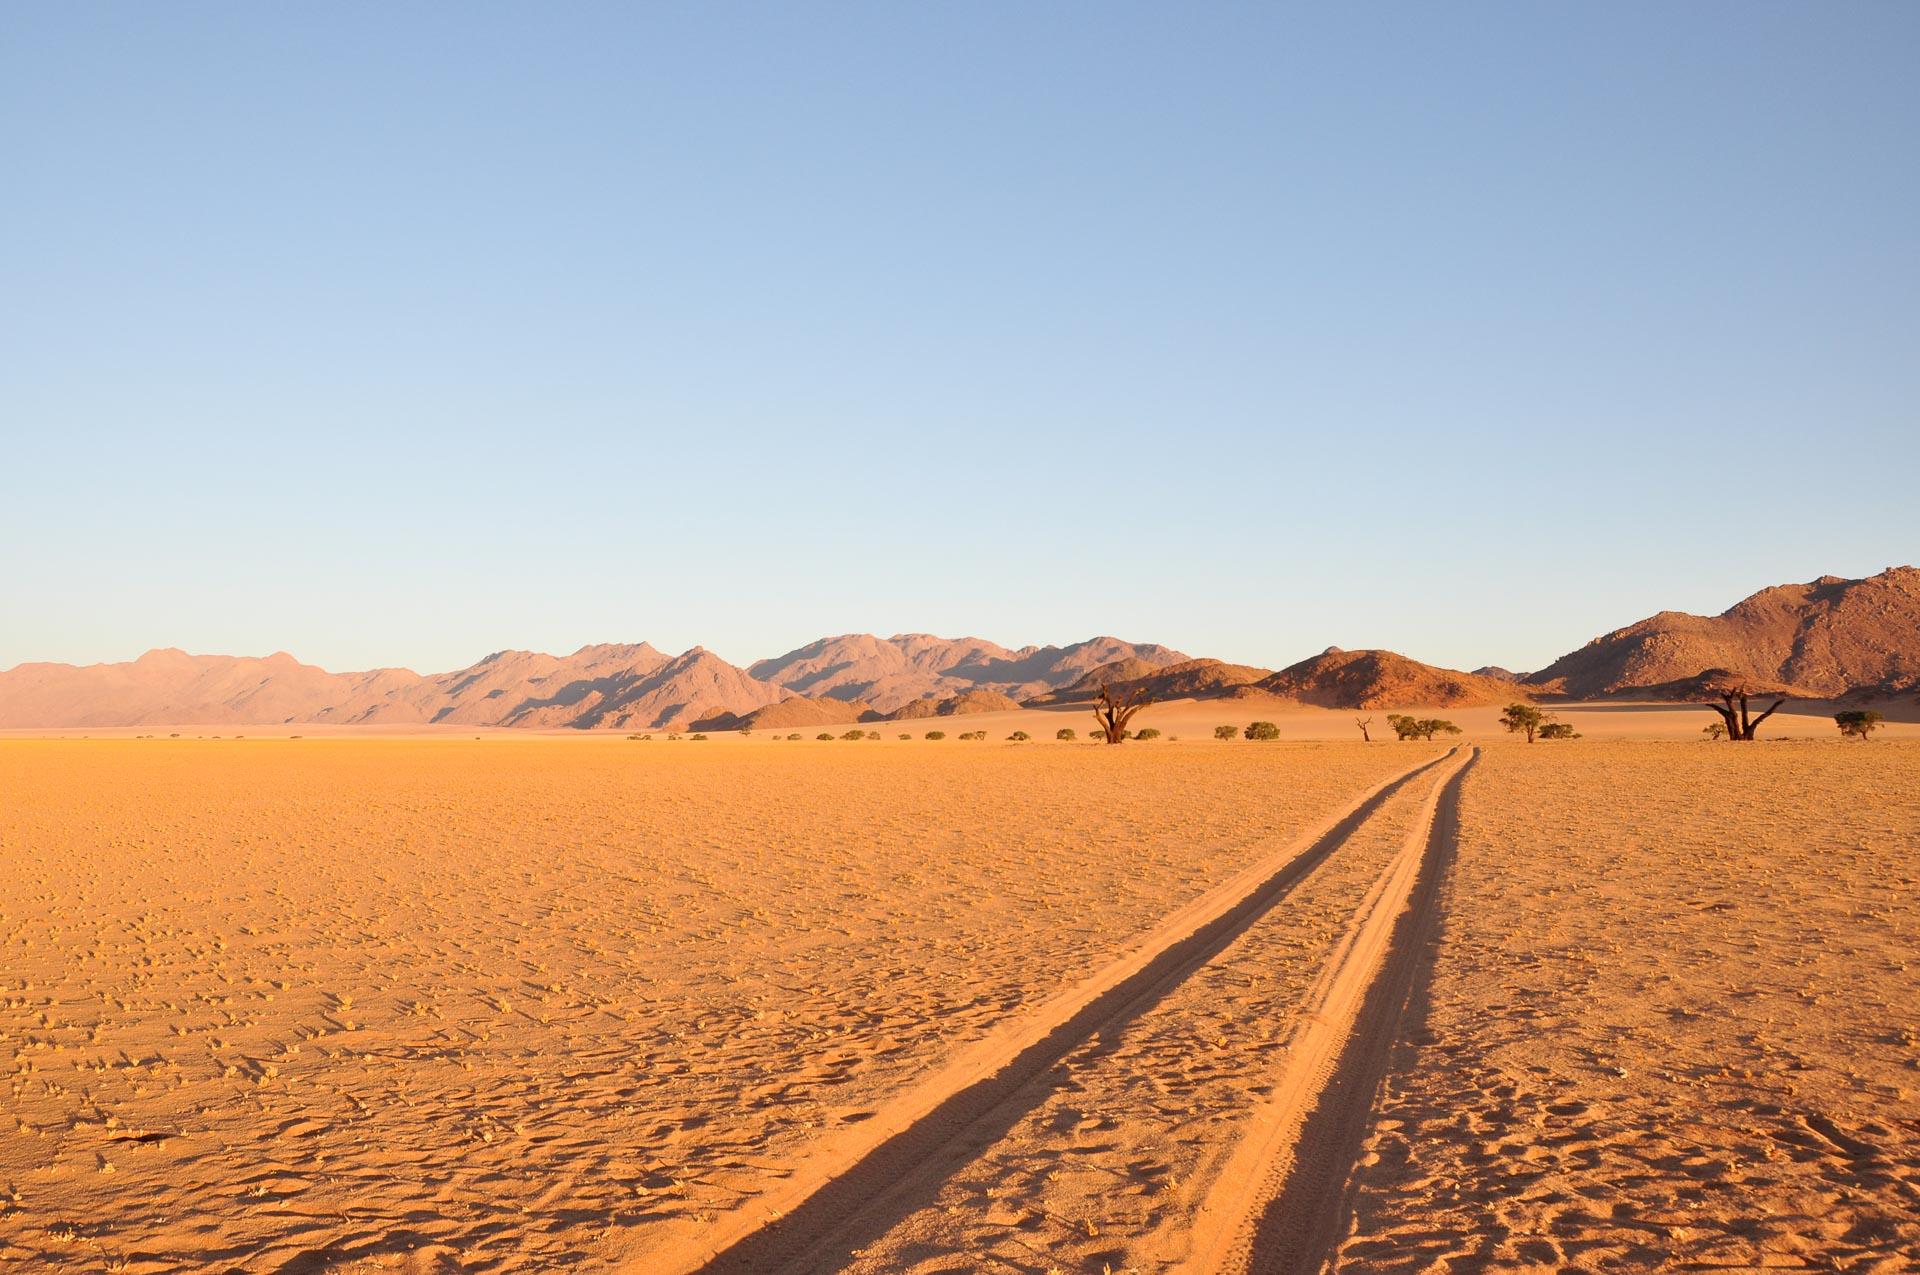 Kanaan-Desert-Retreat-Namibia-Globetrotter-Select-23